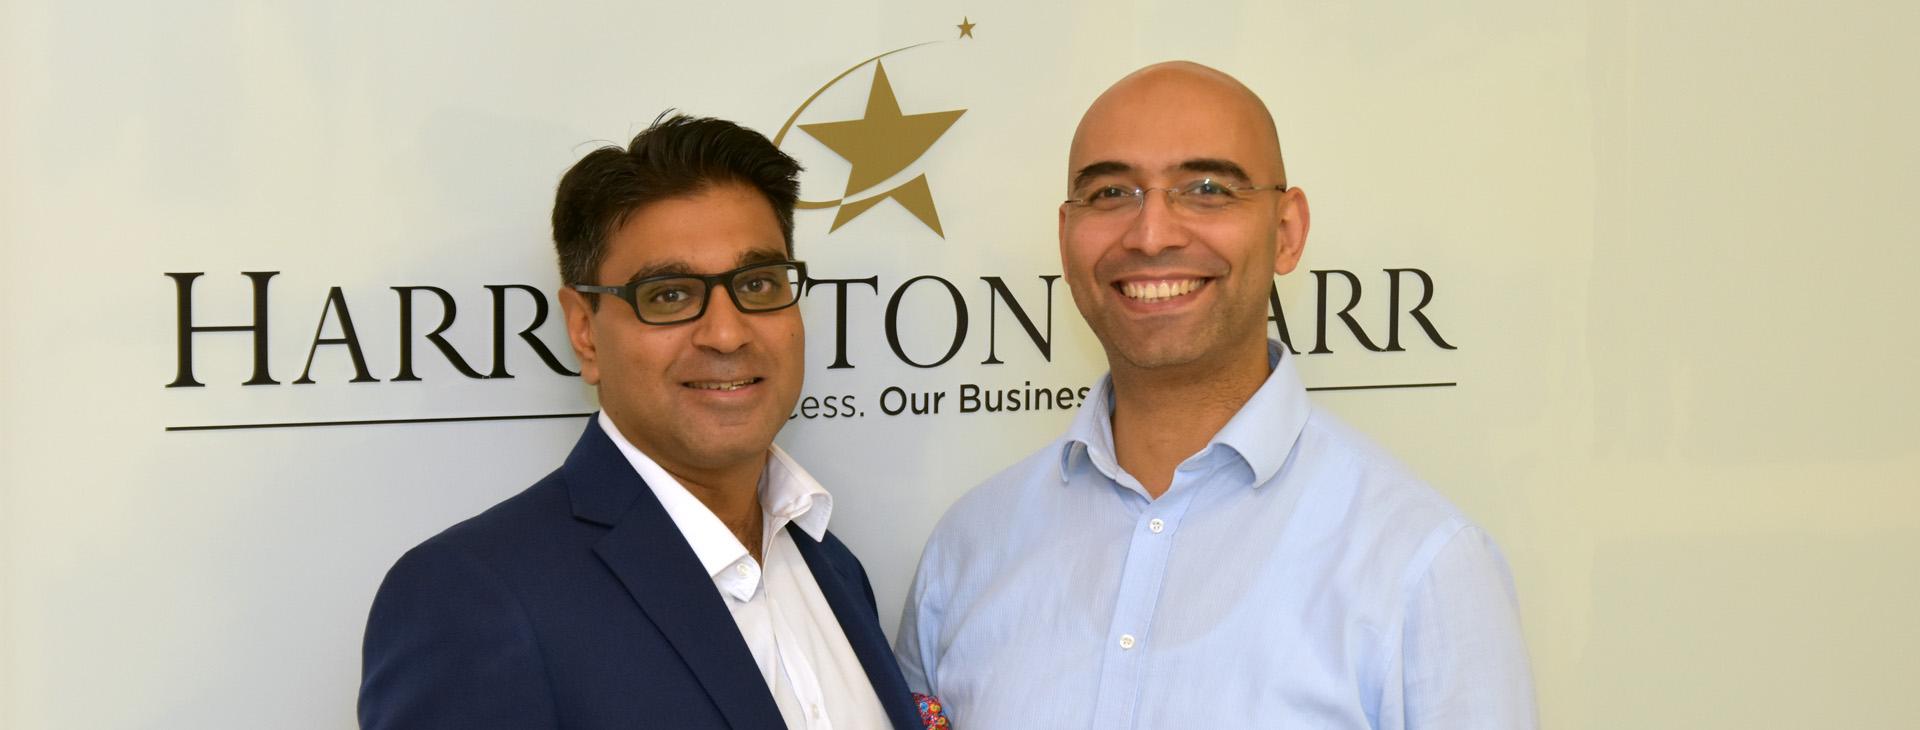 Gav And Ehab Harrington Starr Technology Consulting